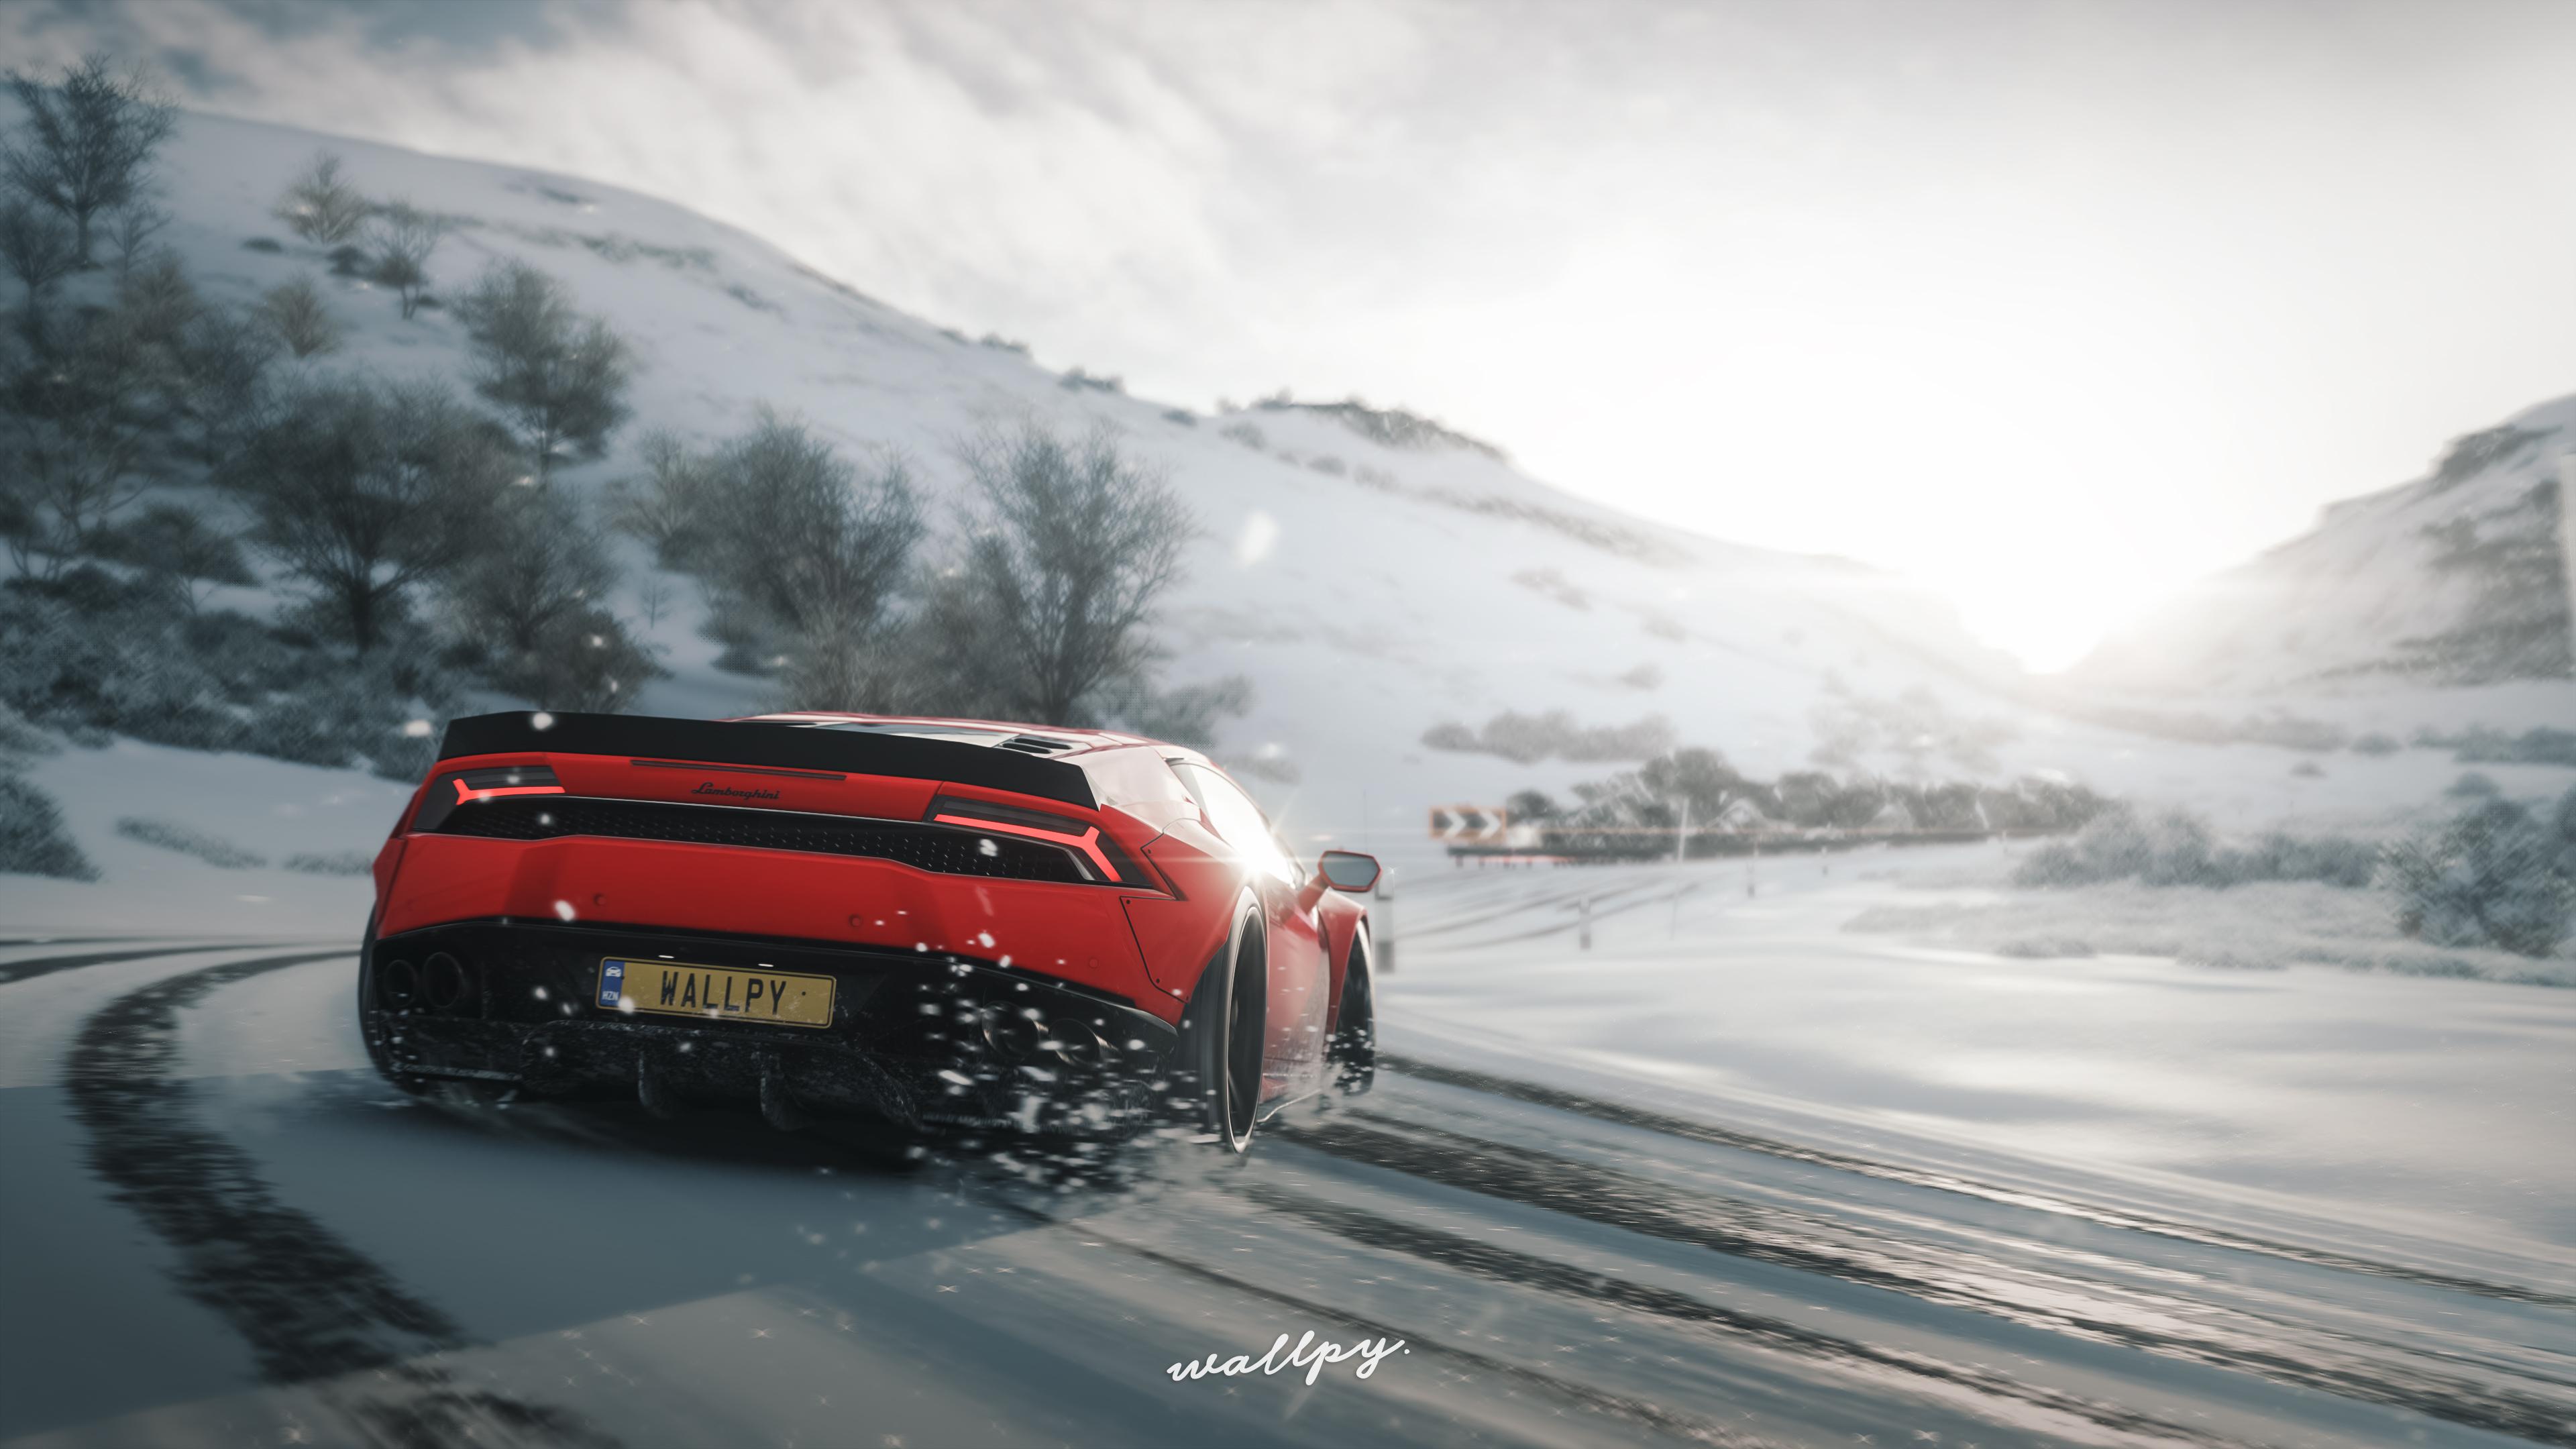 Lamborghini Huracan Drift In Snow Forza Horizon 4 - Forza Horizon 4 Winter - HD Wallpaper